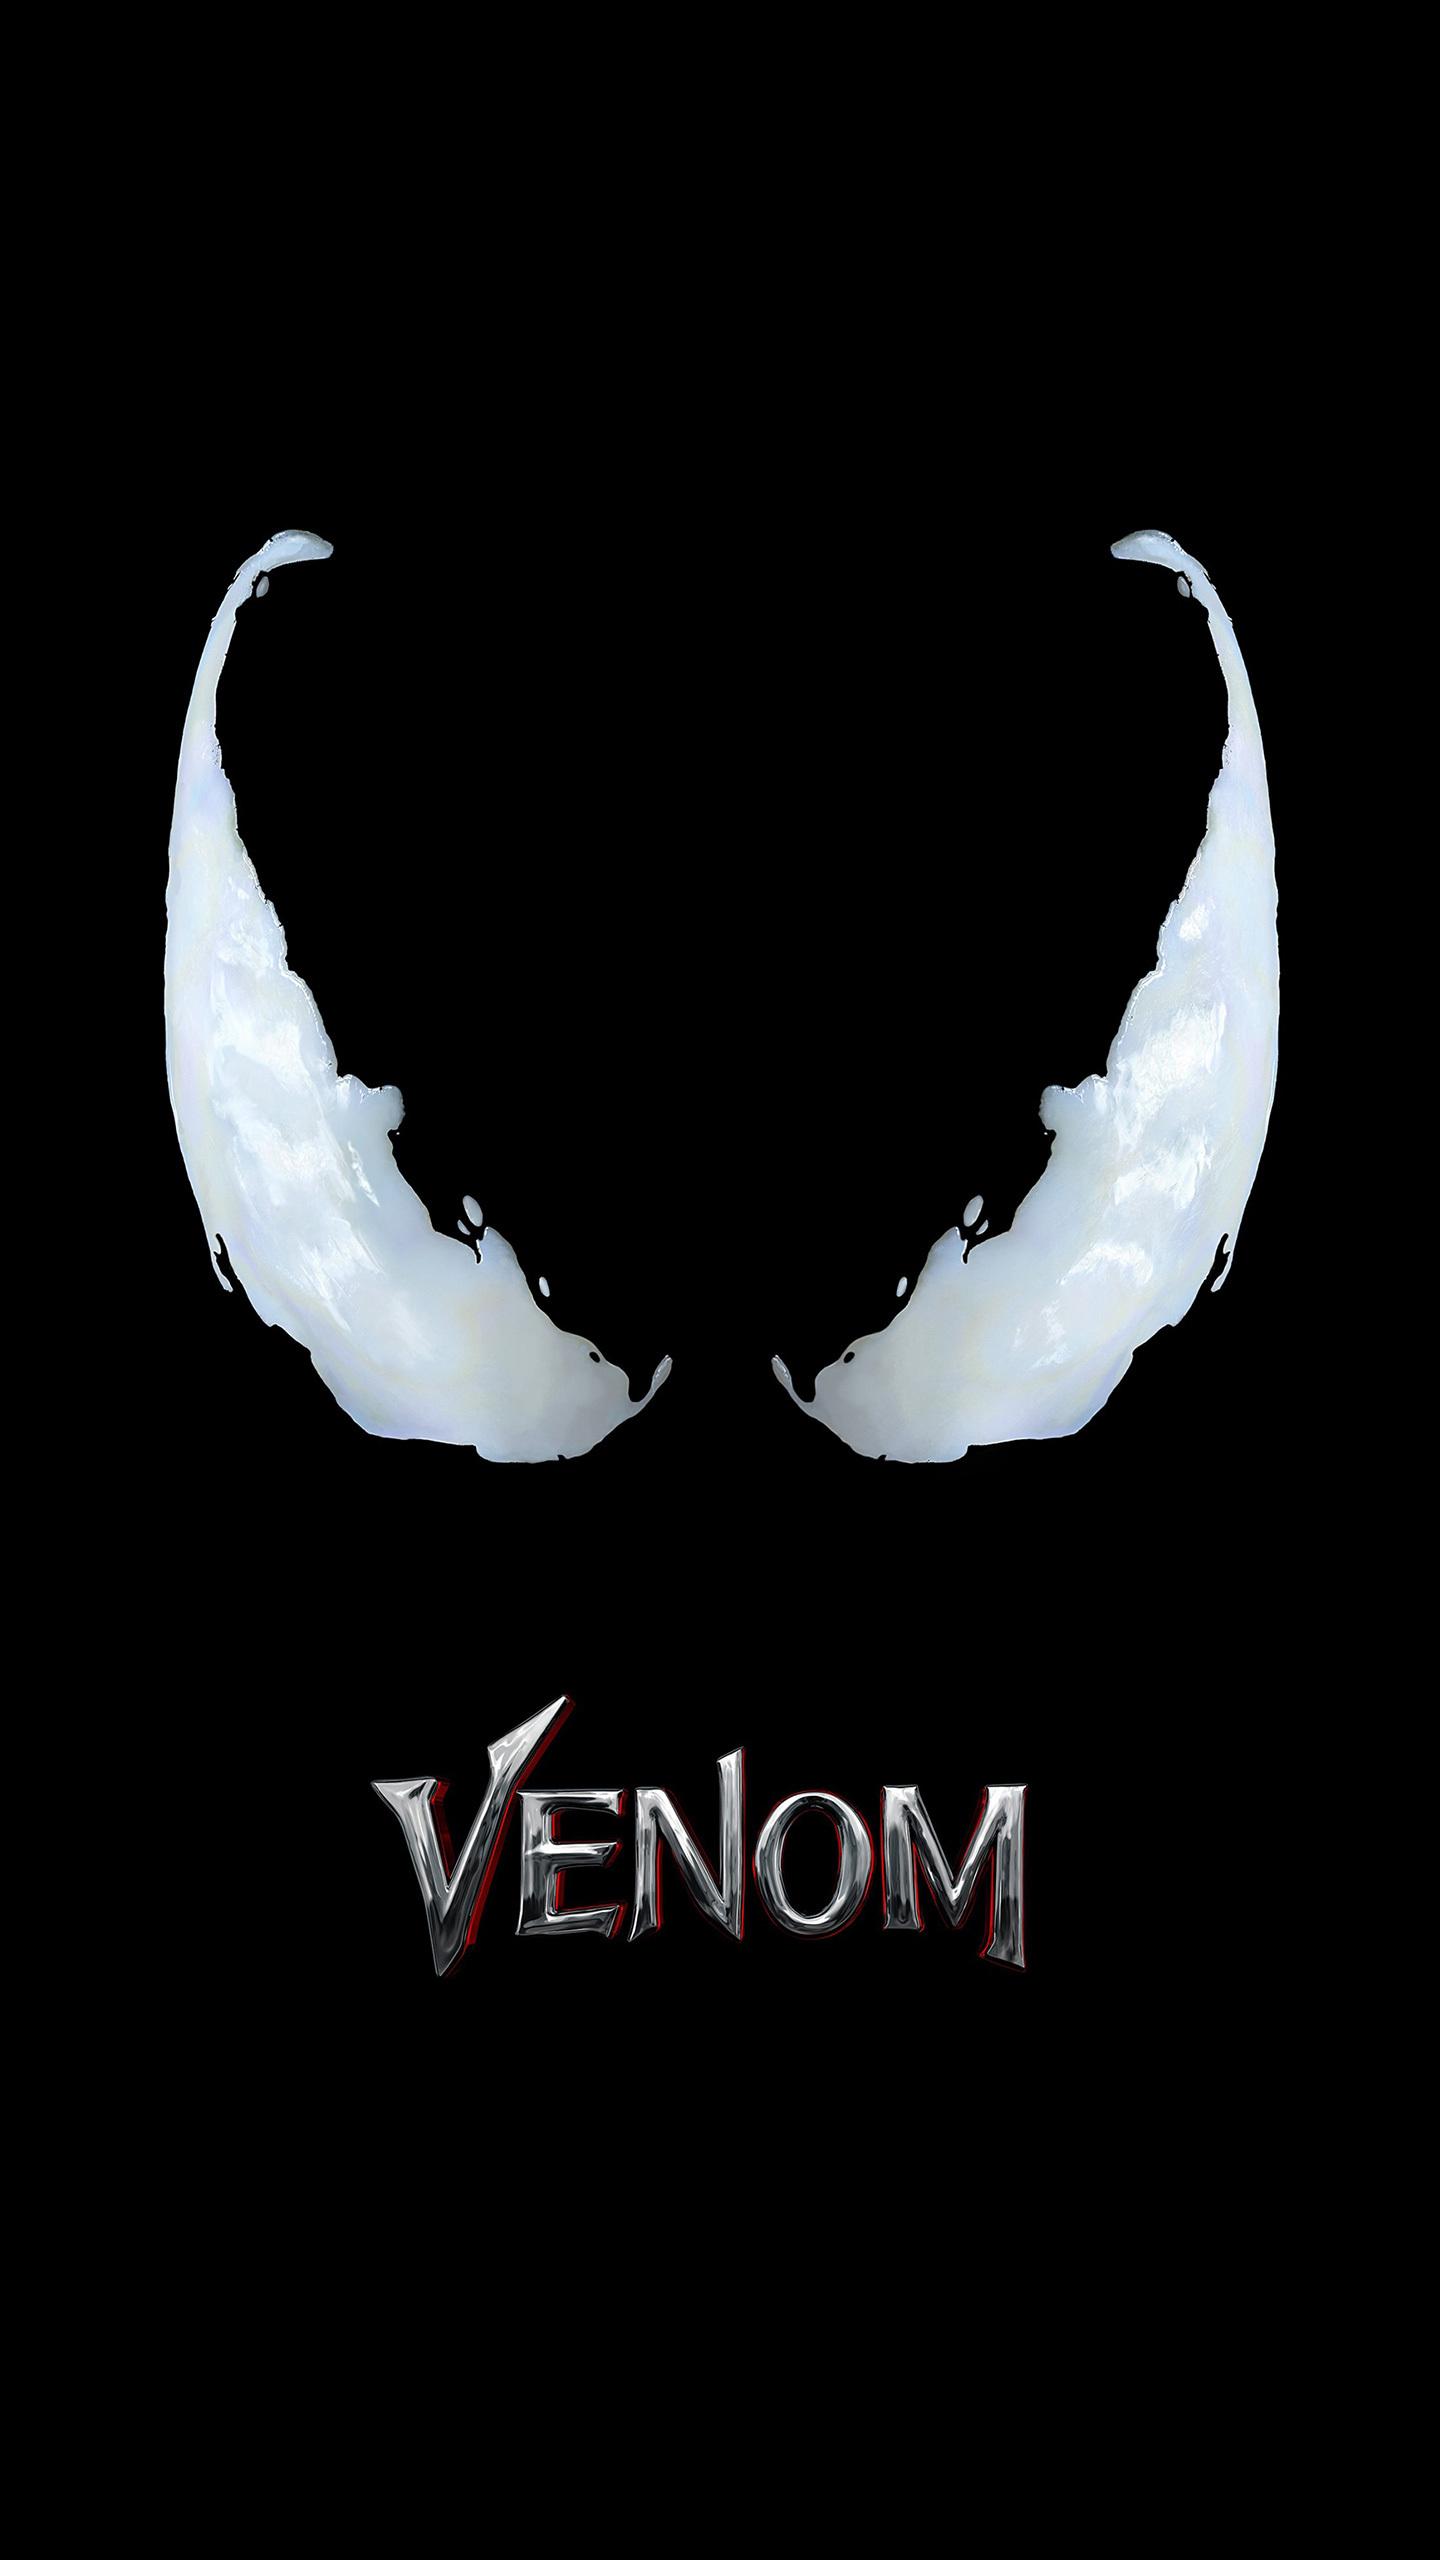 1440x2560 Venom Movie Logo 4k Samsung Galaxy S6s7 Google